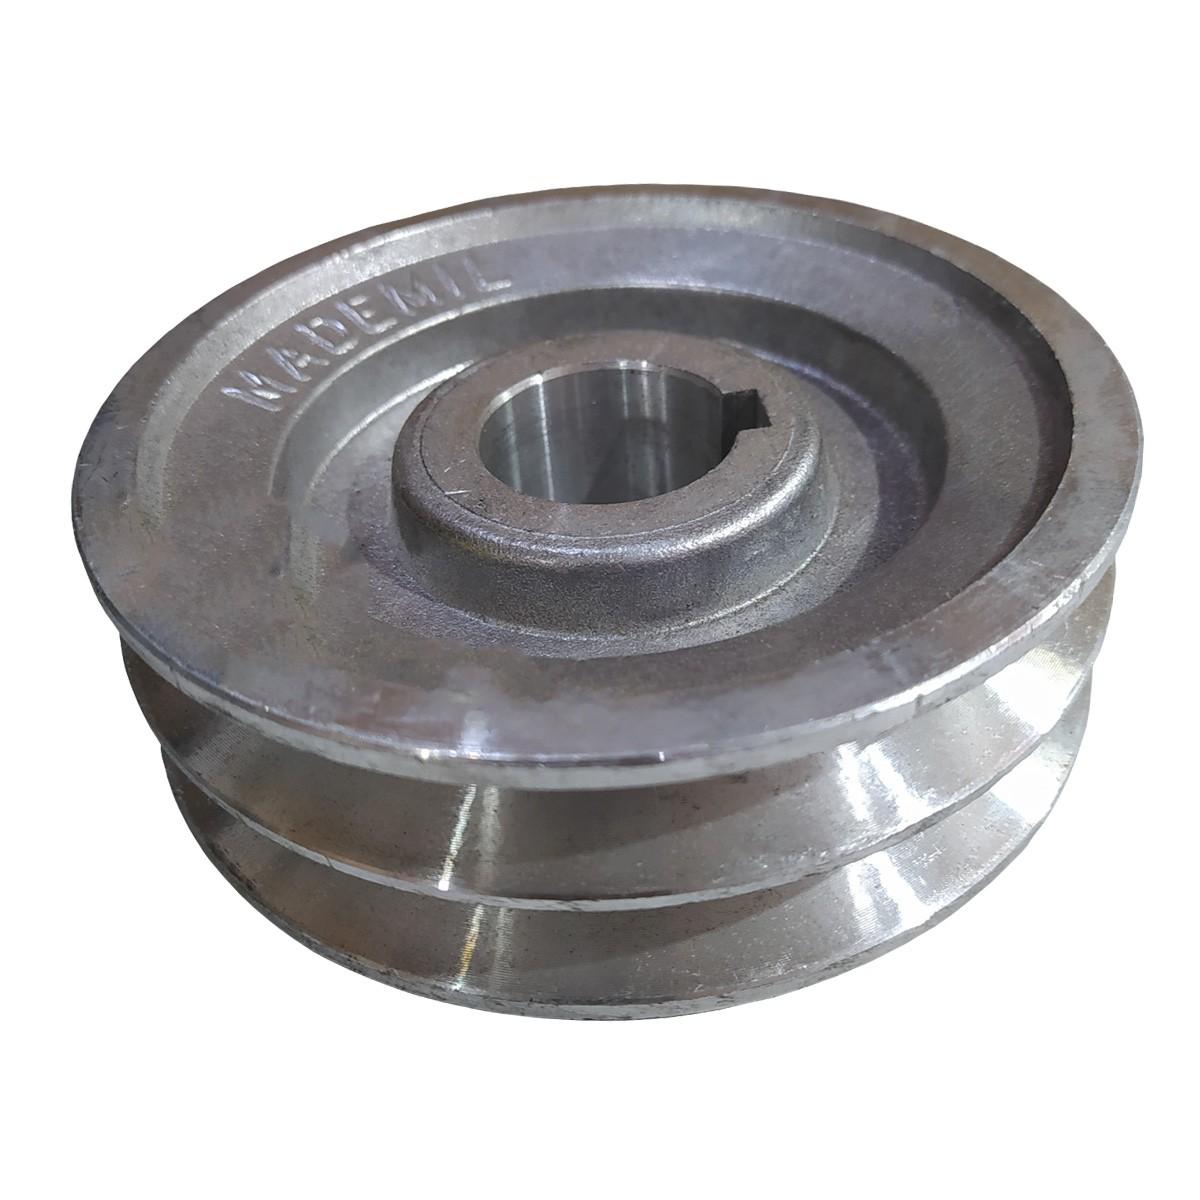 Polia De Aluminio 110mm Motor Furo 28mm 2 Canal A Chaveta